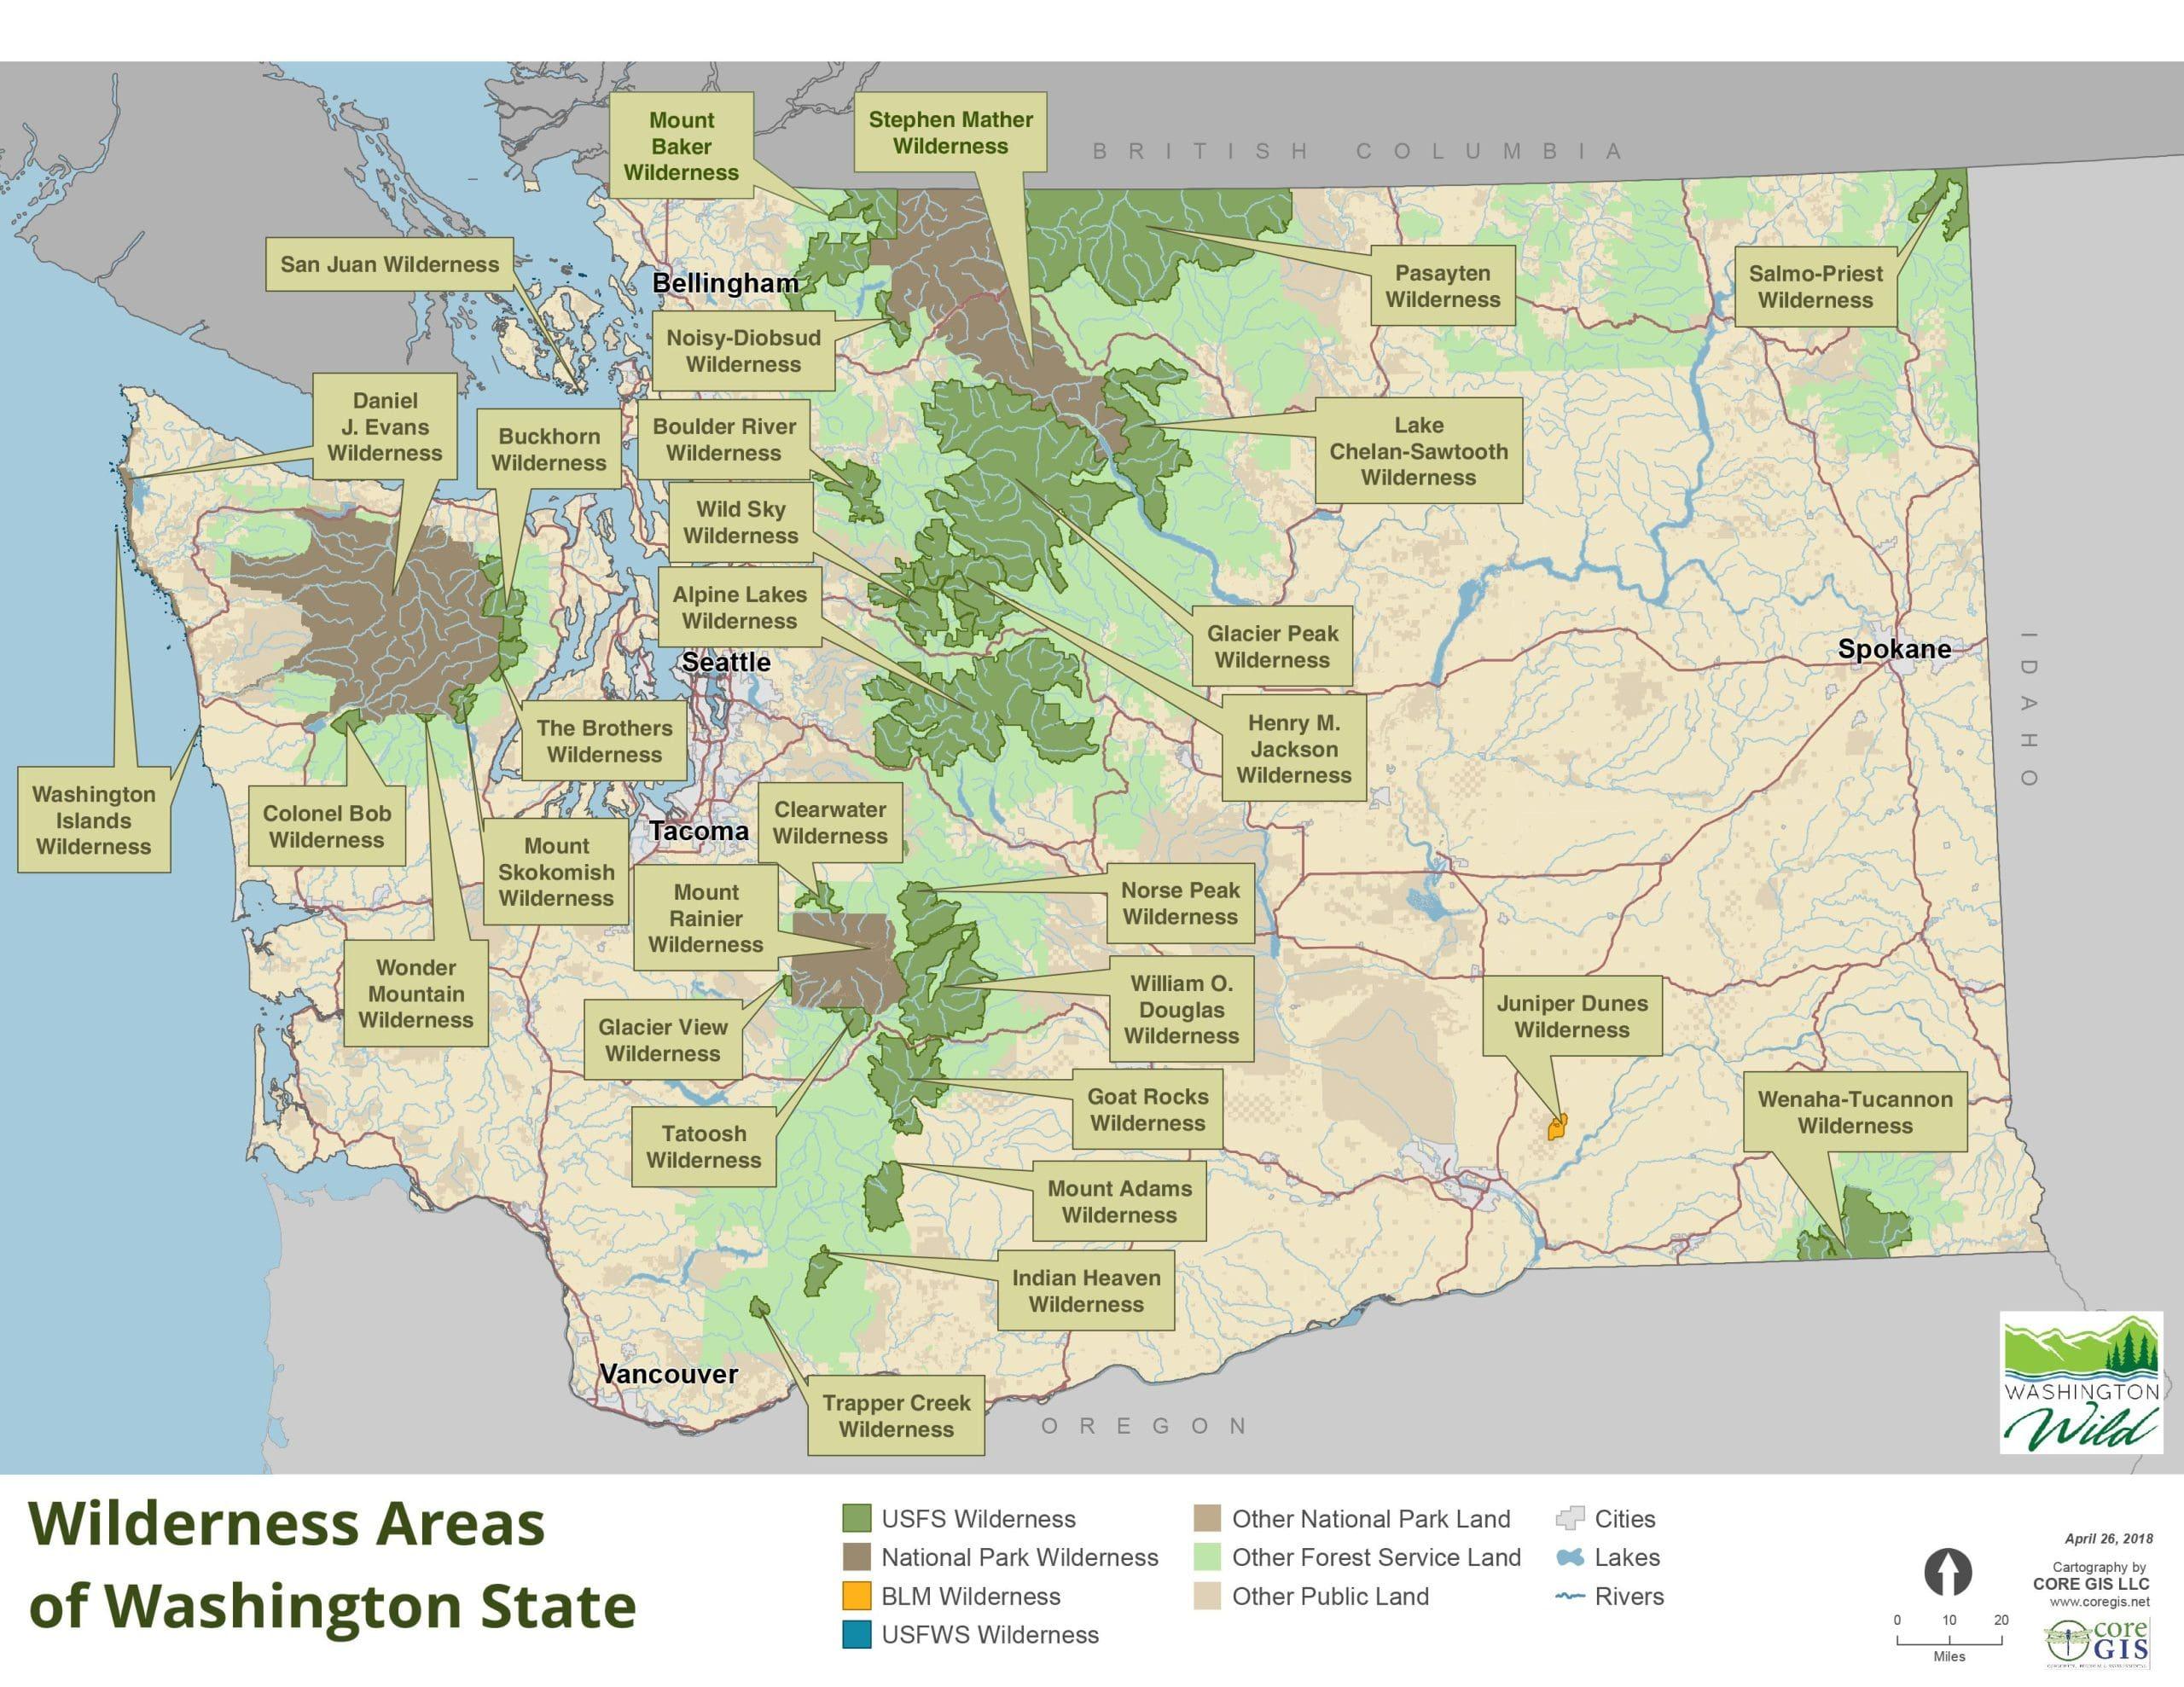 Washington Wild Explore Washington S Wilderness Areas Washington Wild